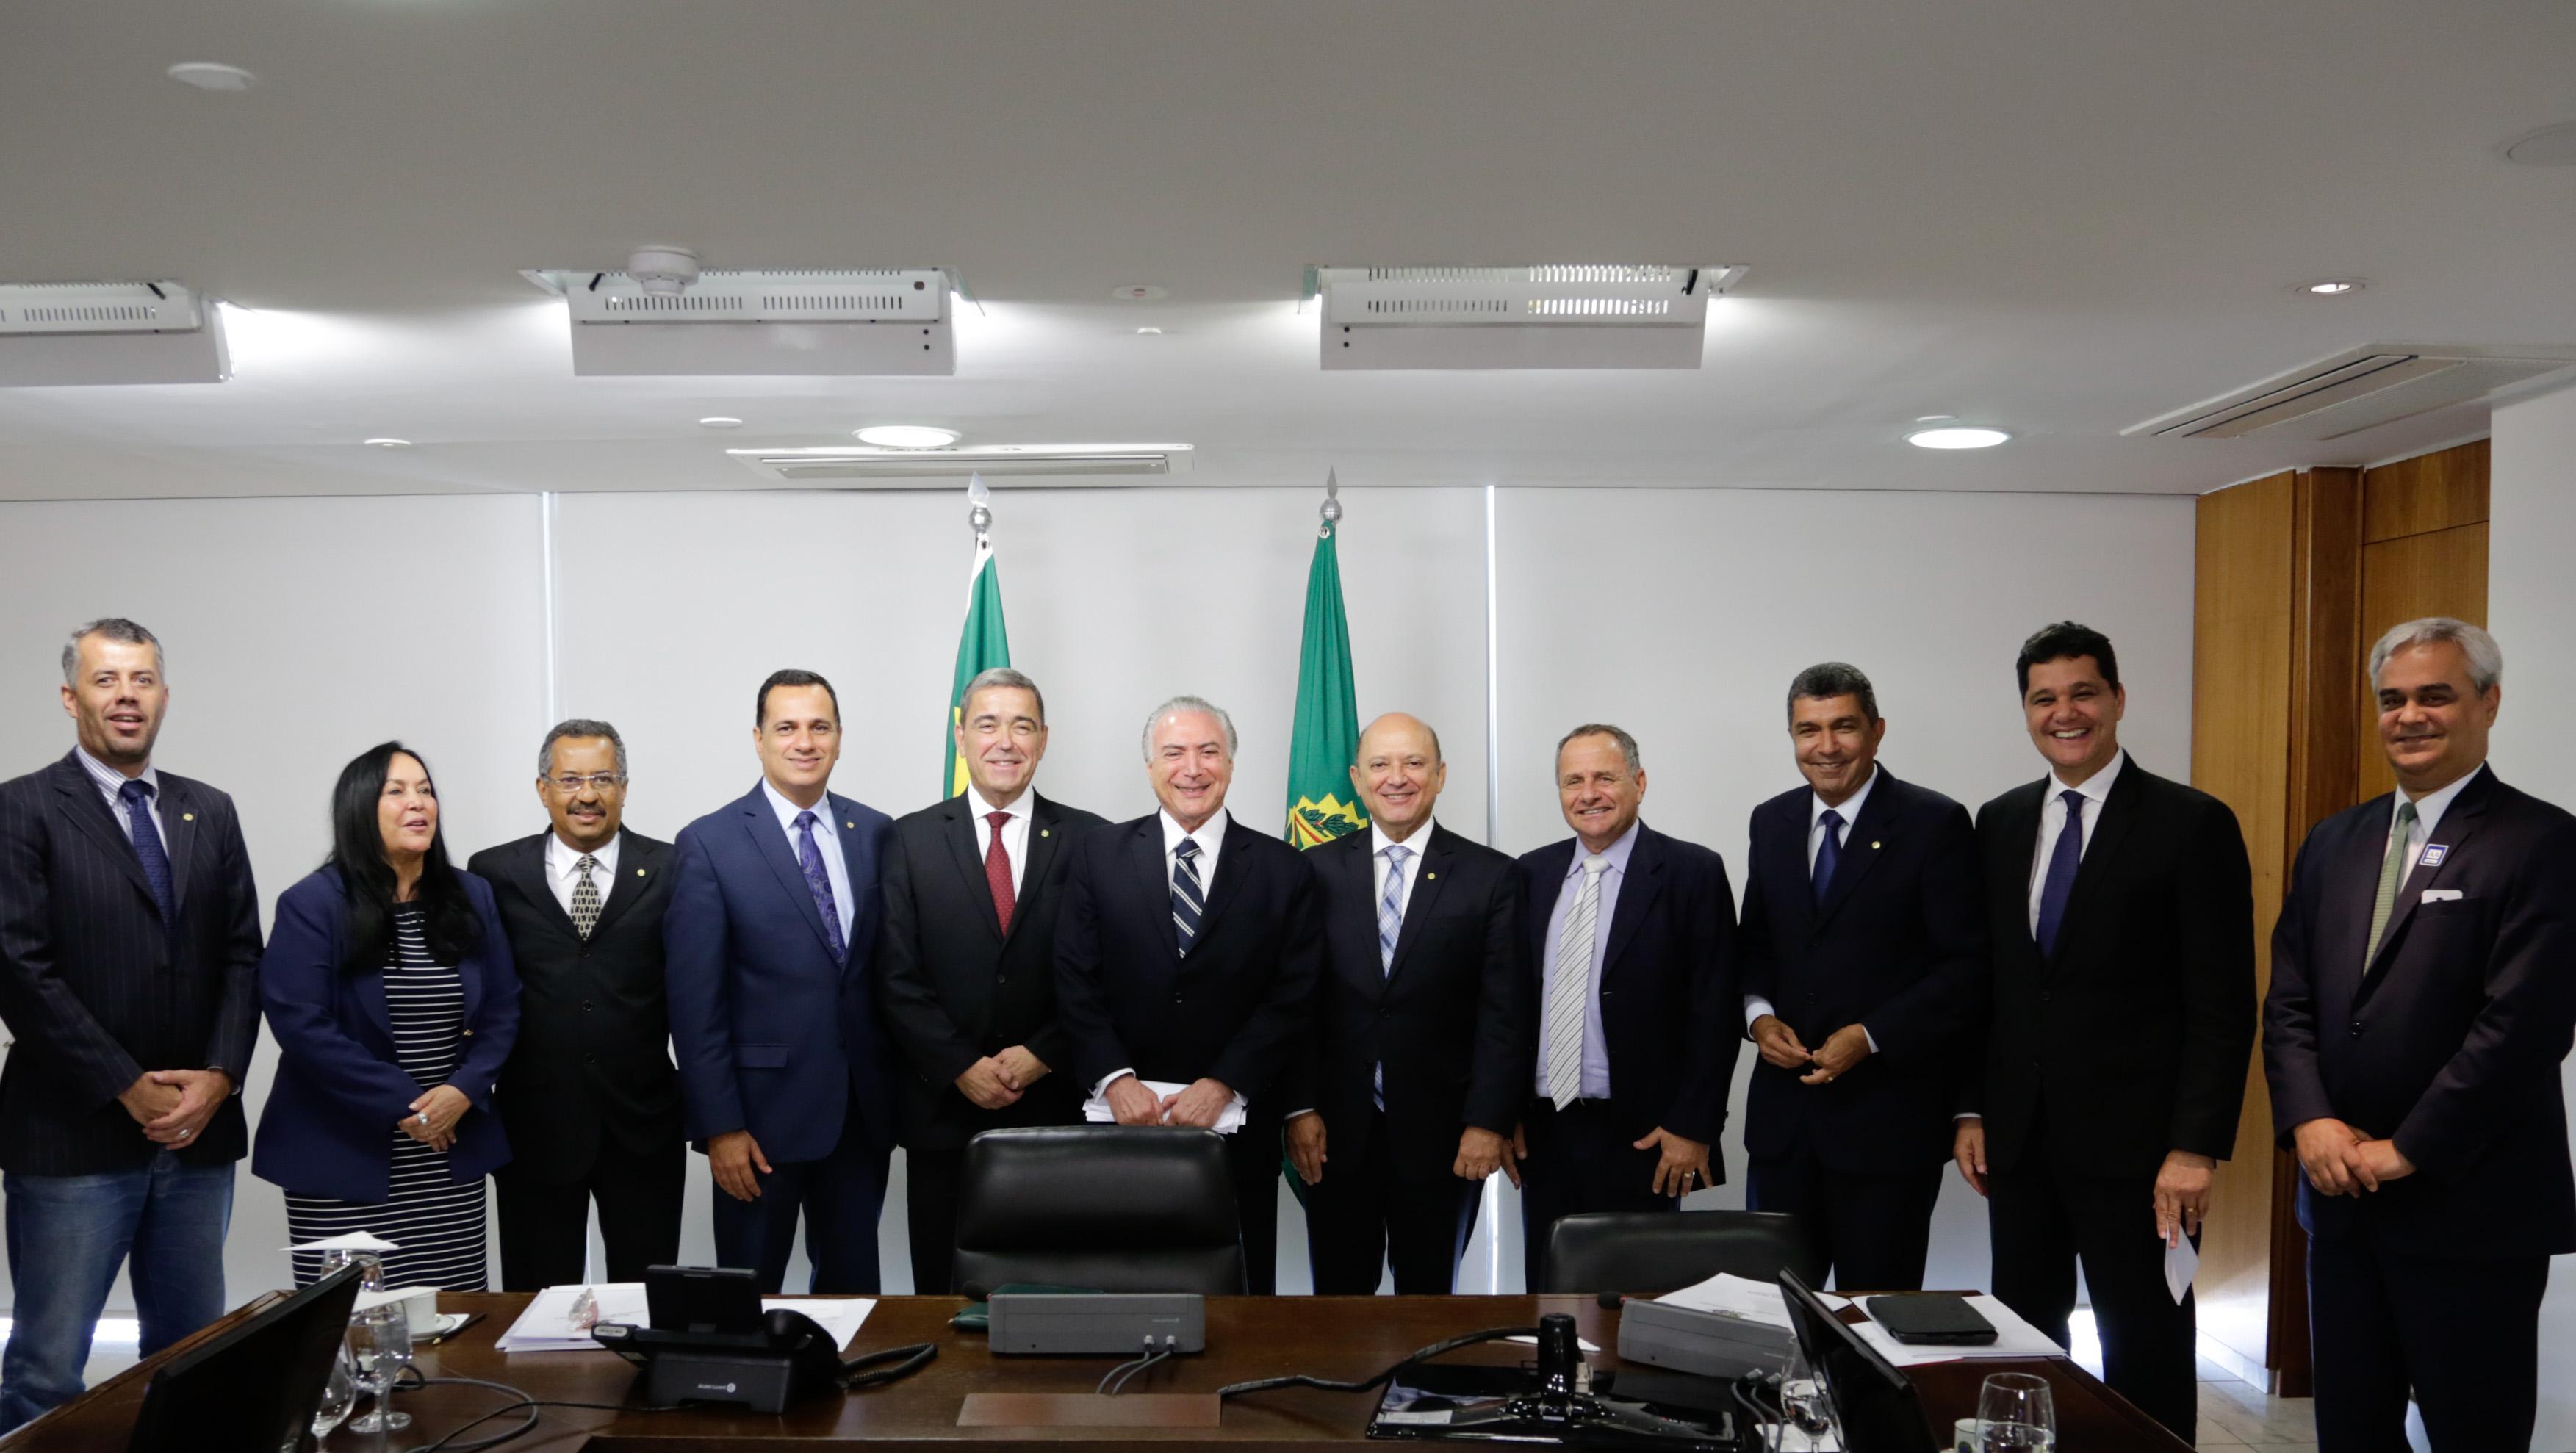 You are currently viewing Bancada Capixaba se reuniu com o presidente Michel Temer